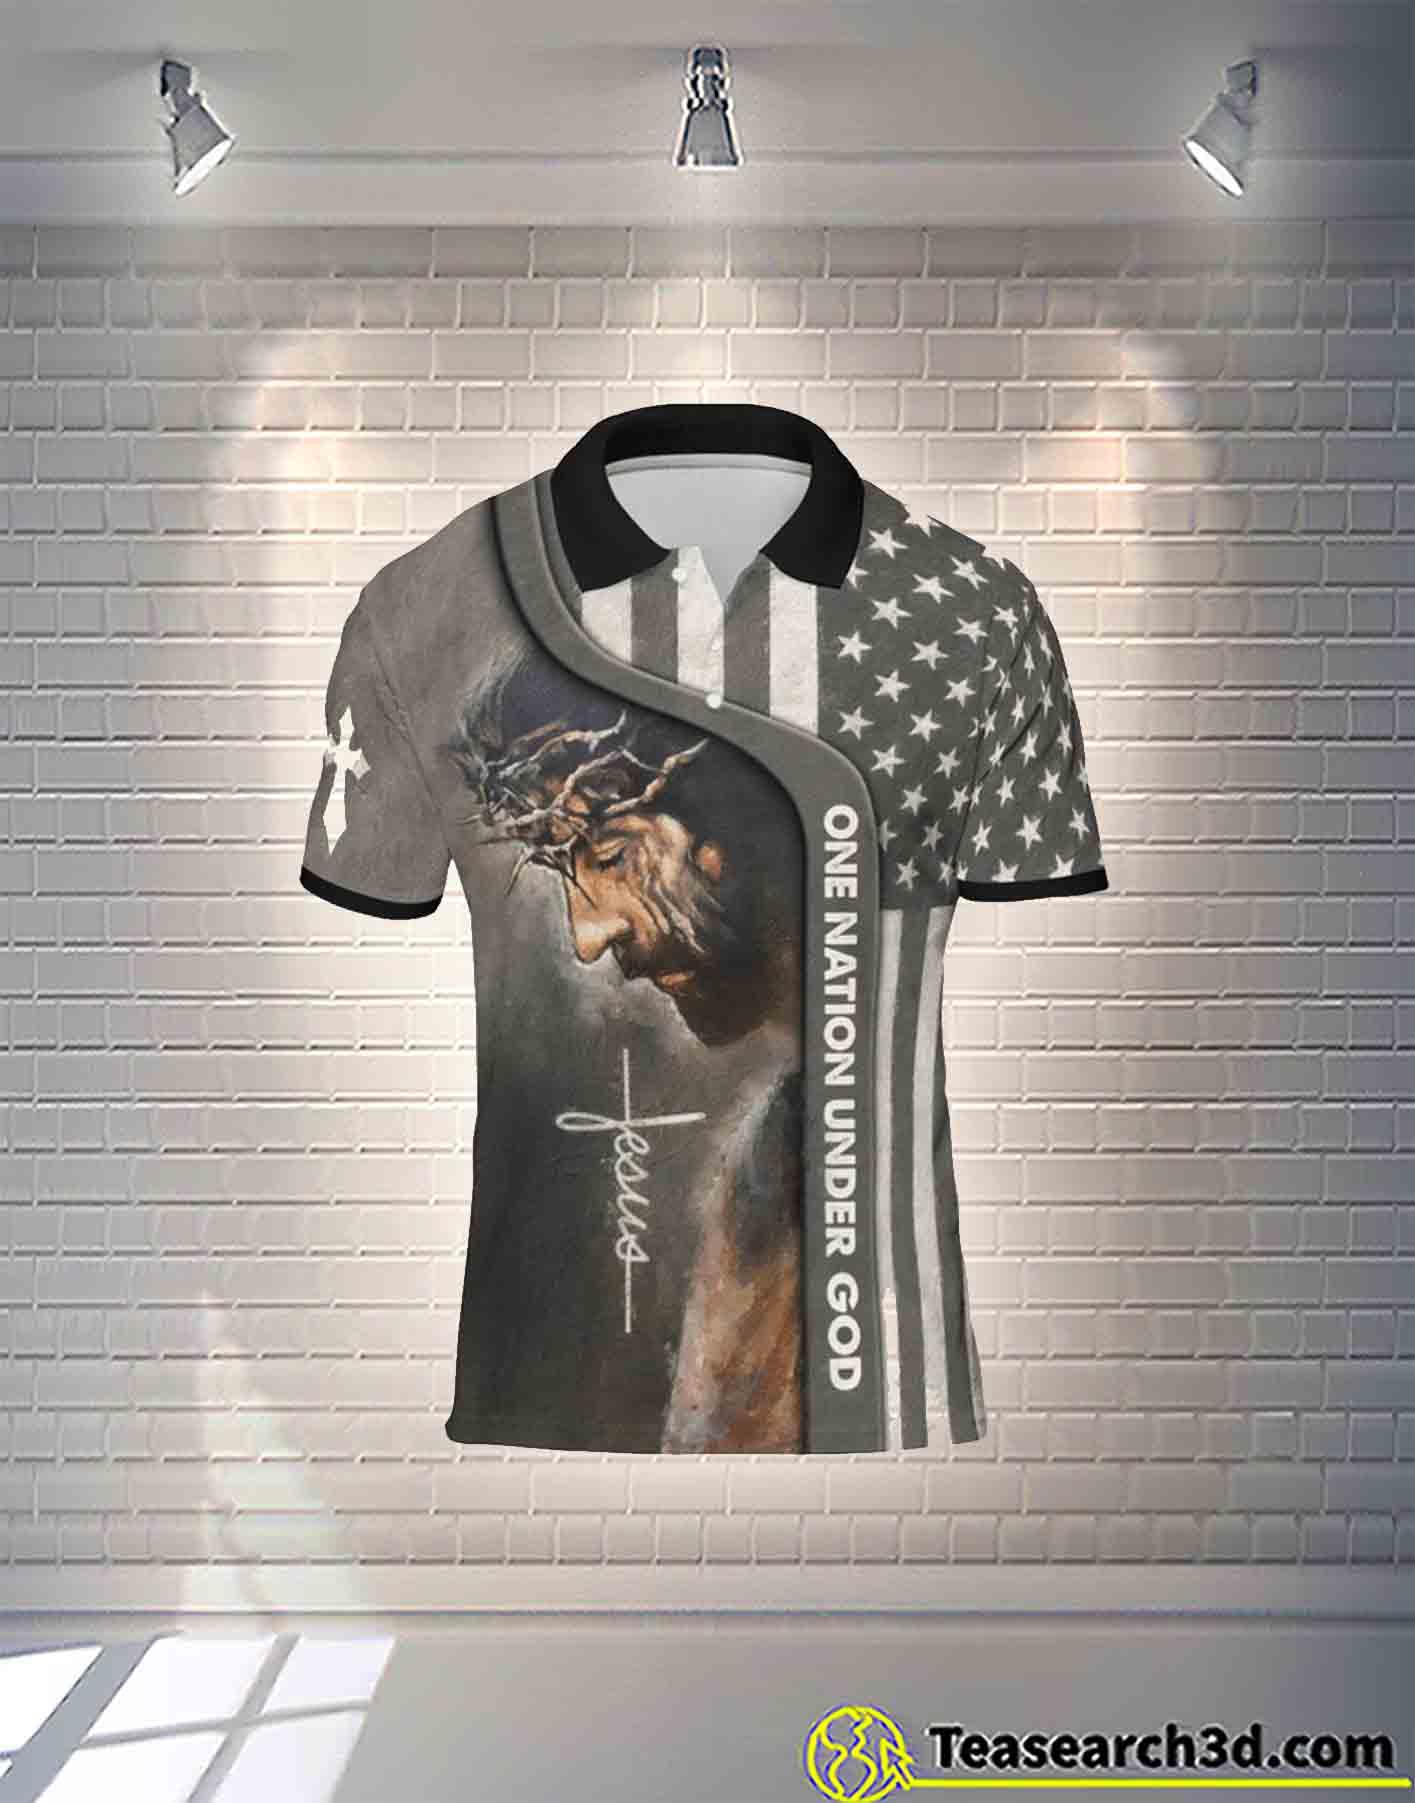 Jesus one nation under god polo t-shirt